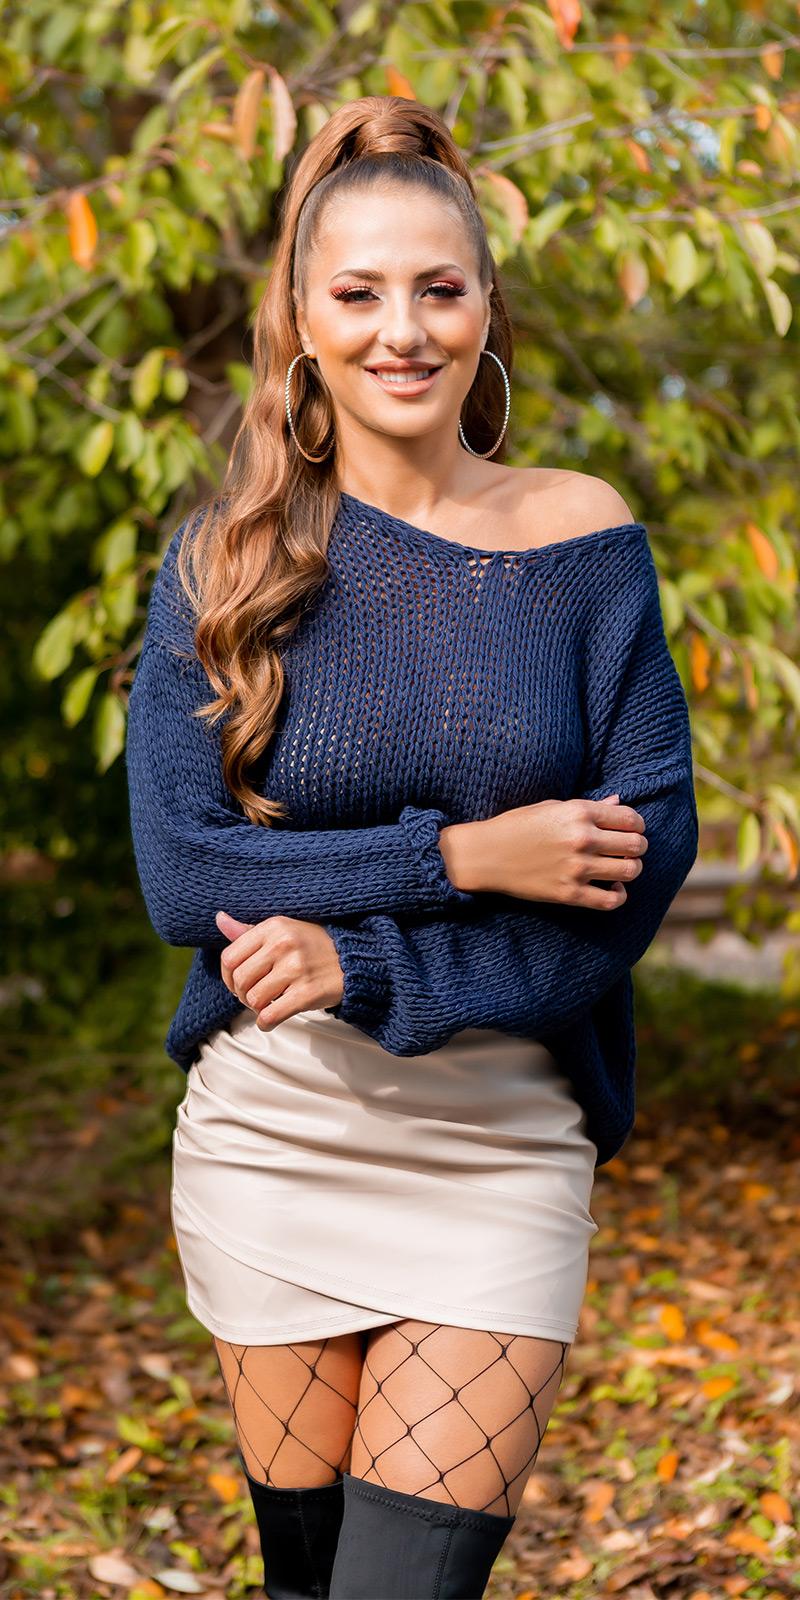 Pulover tricot larg la moda cu decolteu in v